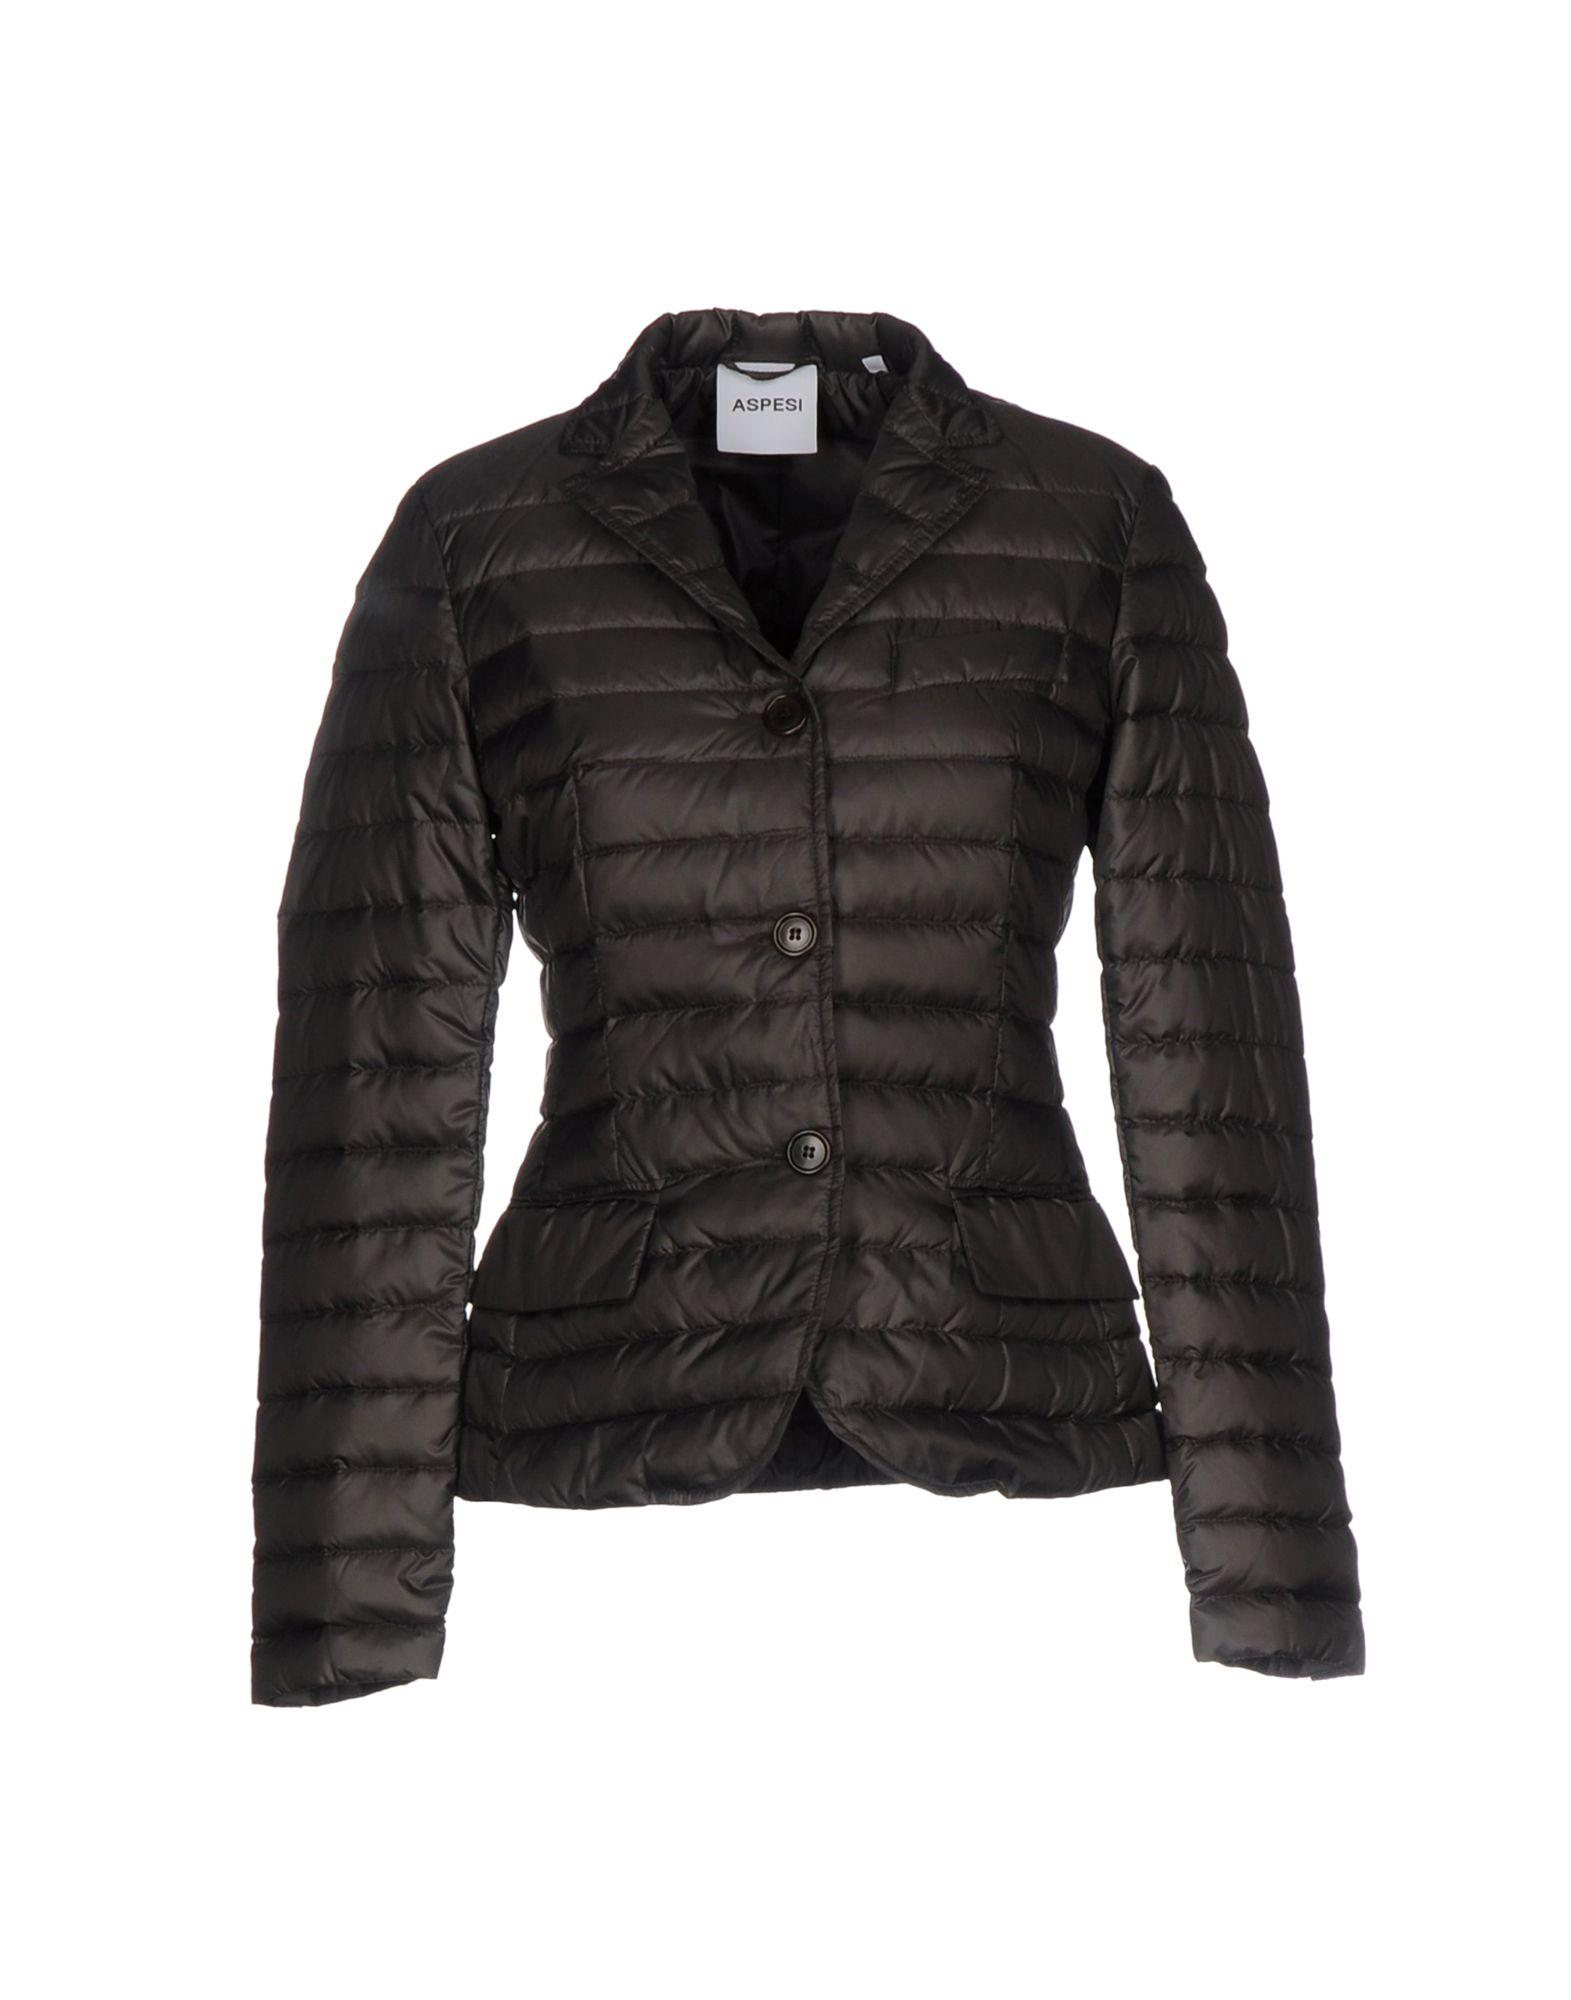 Aspesi Down Jackets In Dark Brown